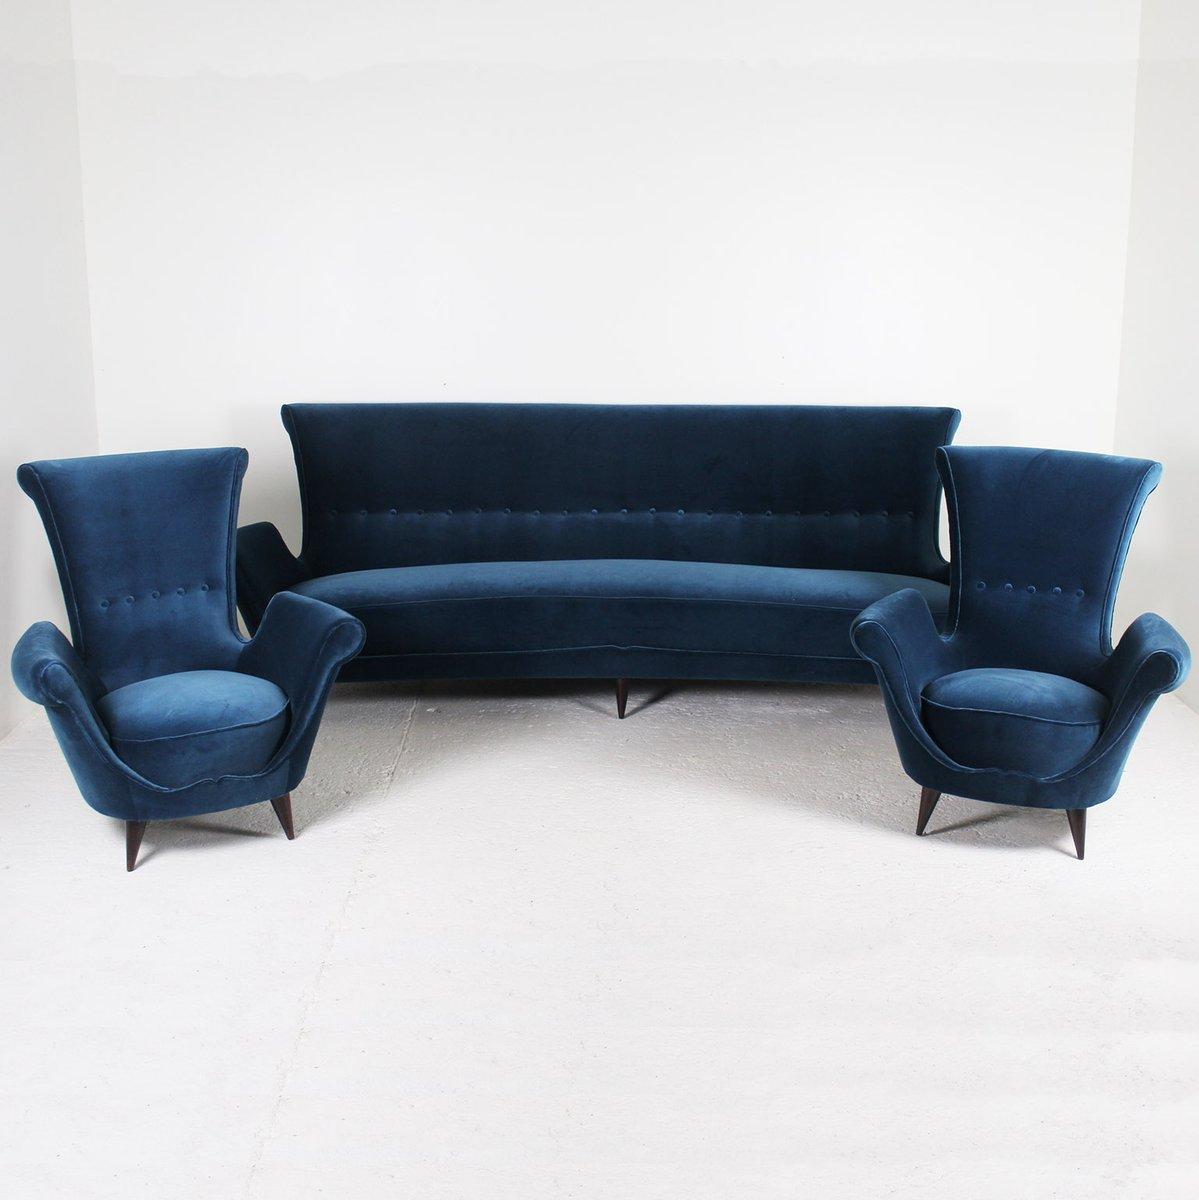 blaues samt sofa 1950er bei pamono kaufen. Black Bedroom Furniture Sets. Home Design Ideas